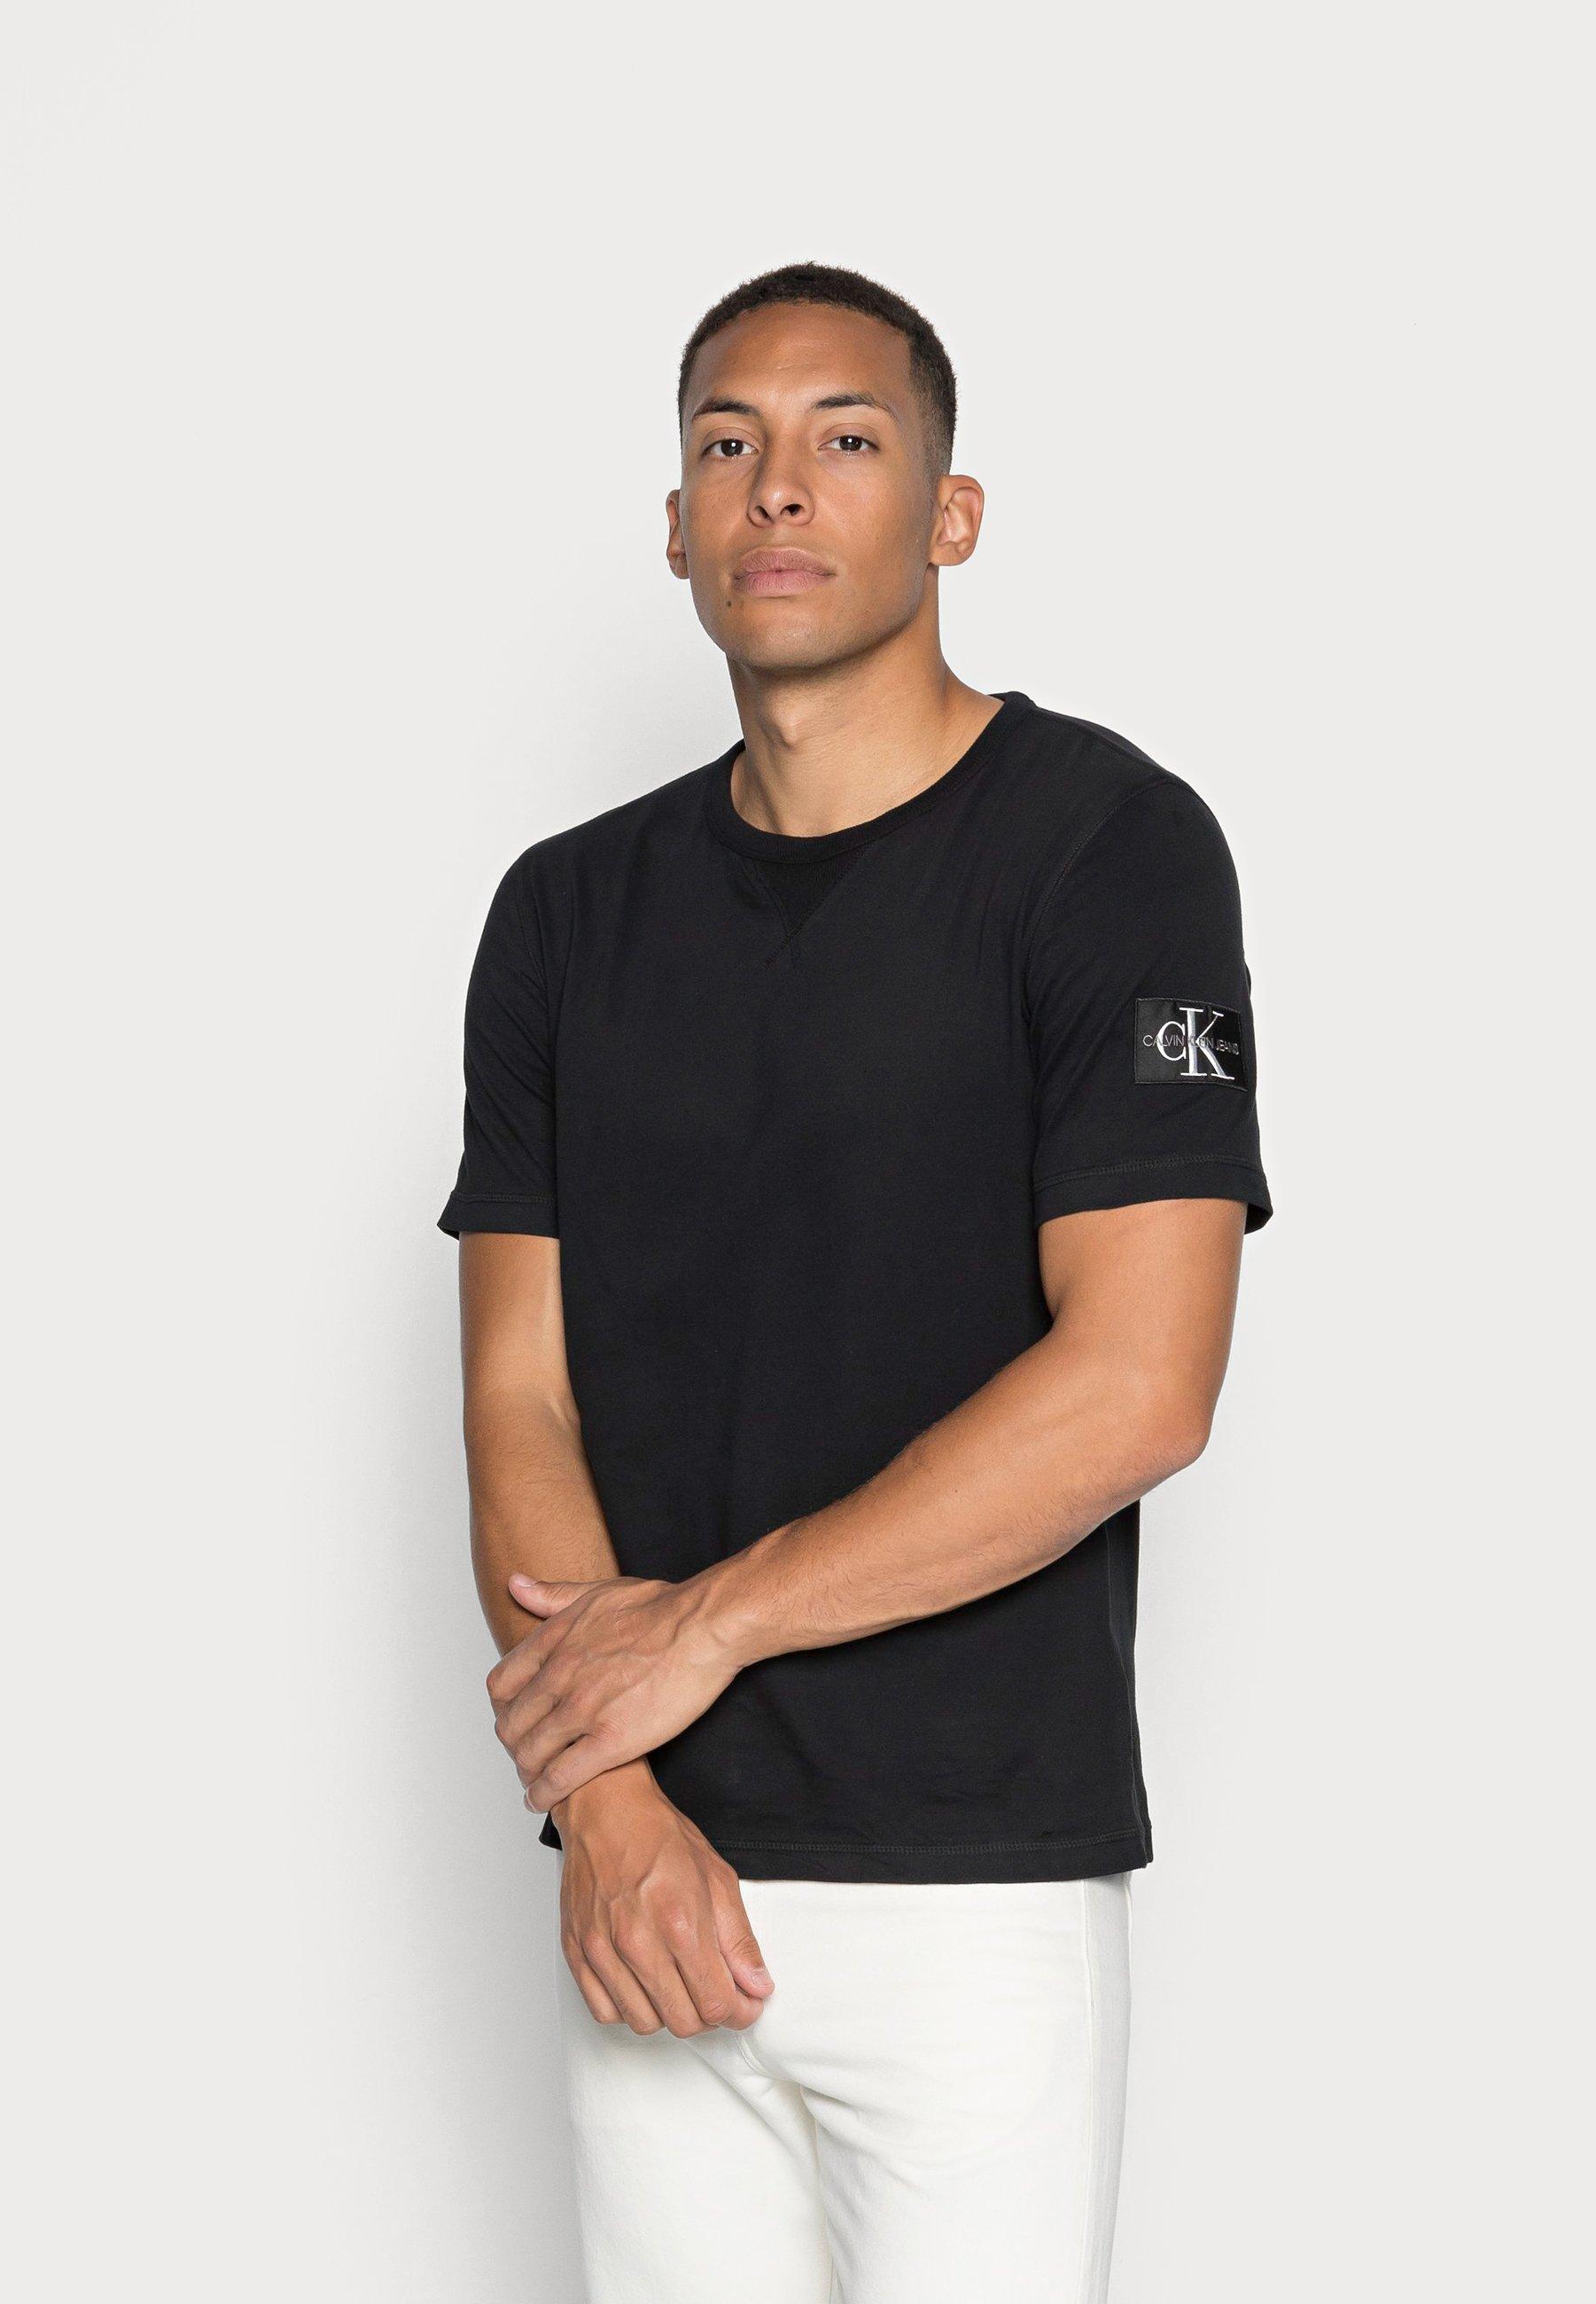 Homme MONOGRAM SLEEVE BADGE TEE - T-shirt basique - black